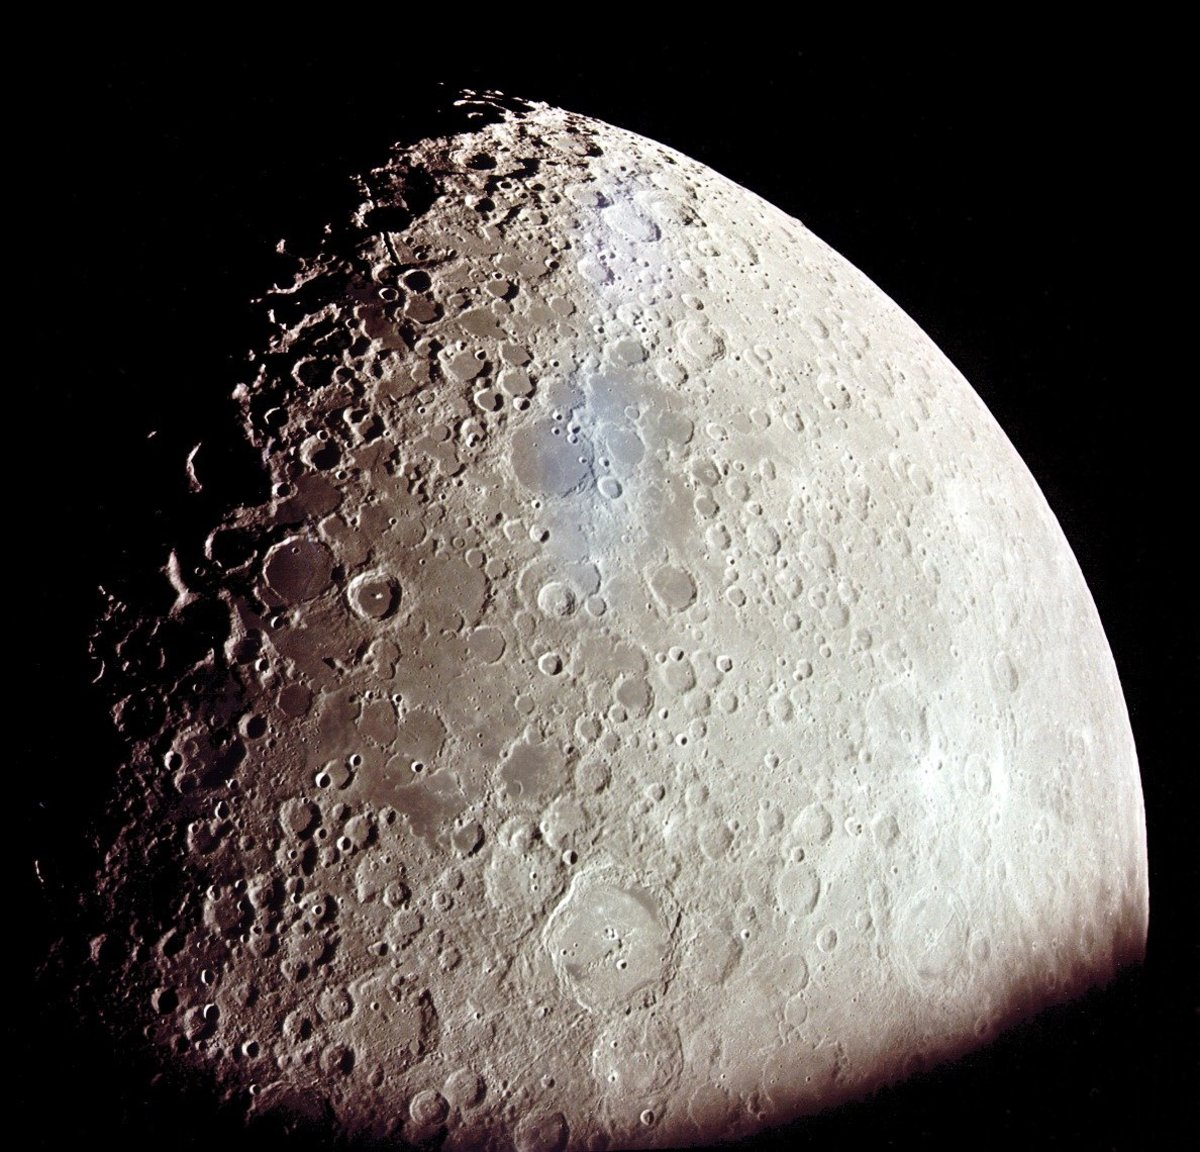 Image in Public Domain, by NASA